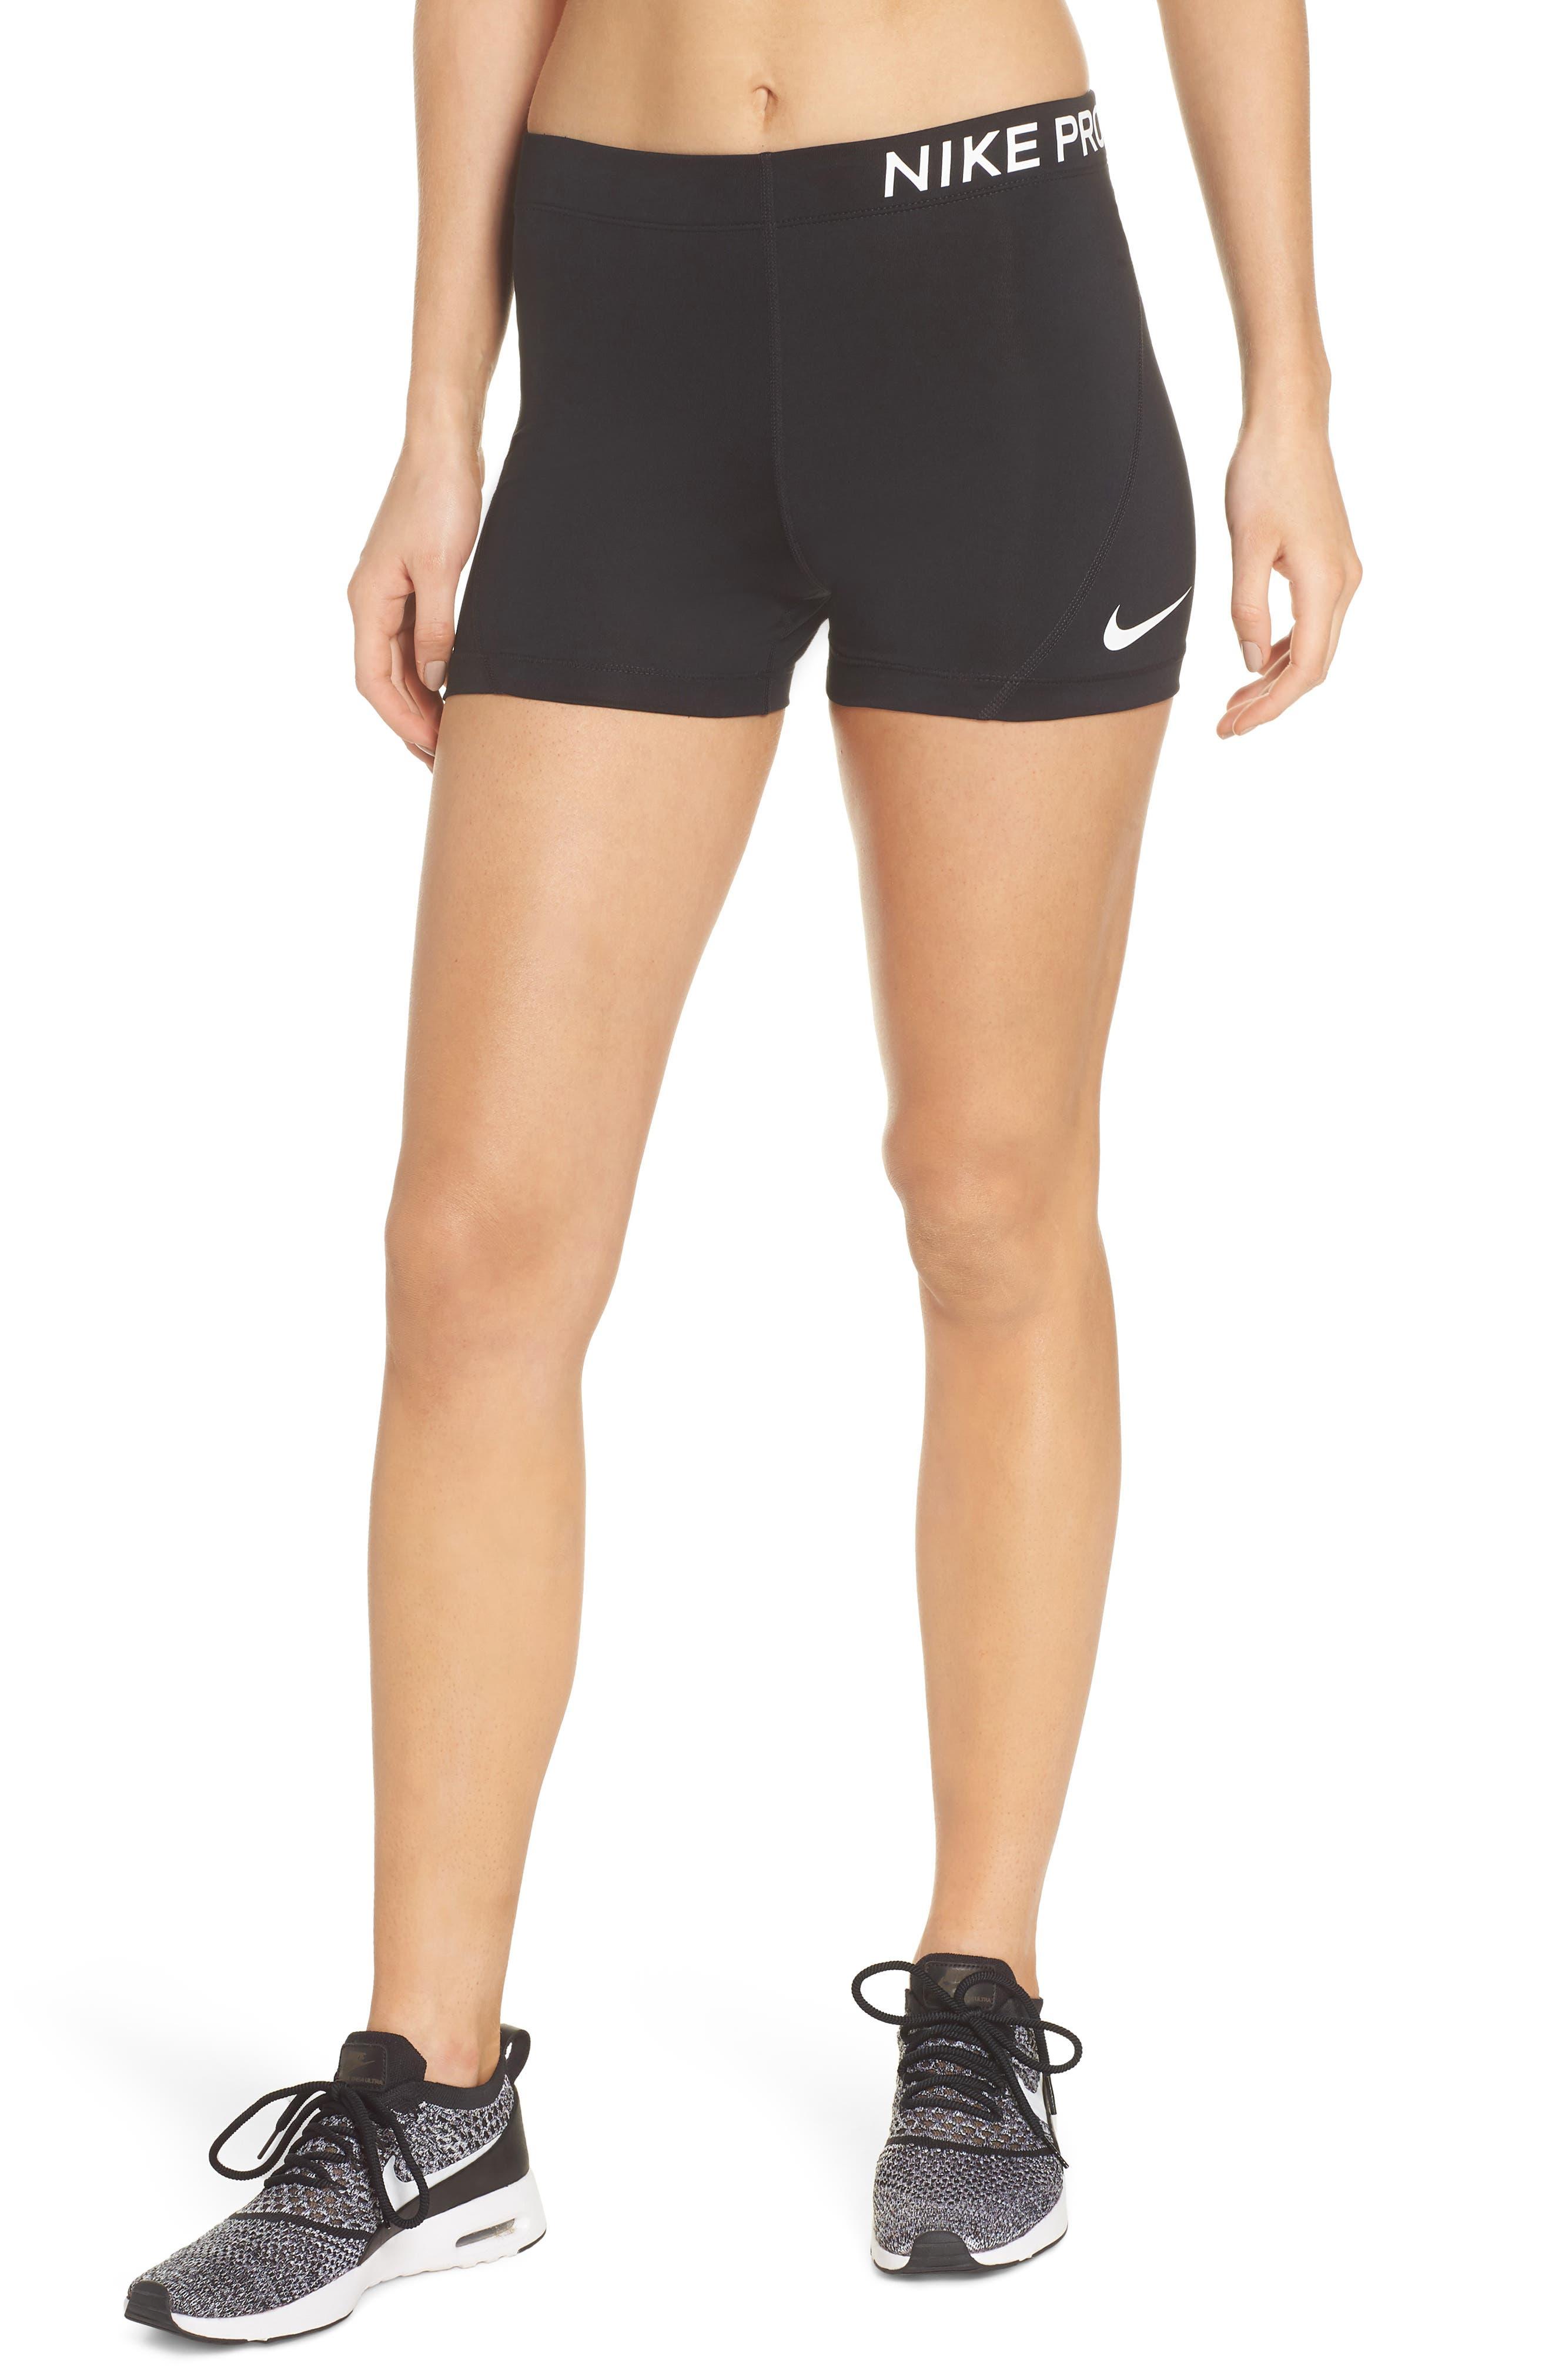 a5e44f9d897 Nike for Women